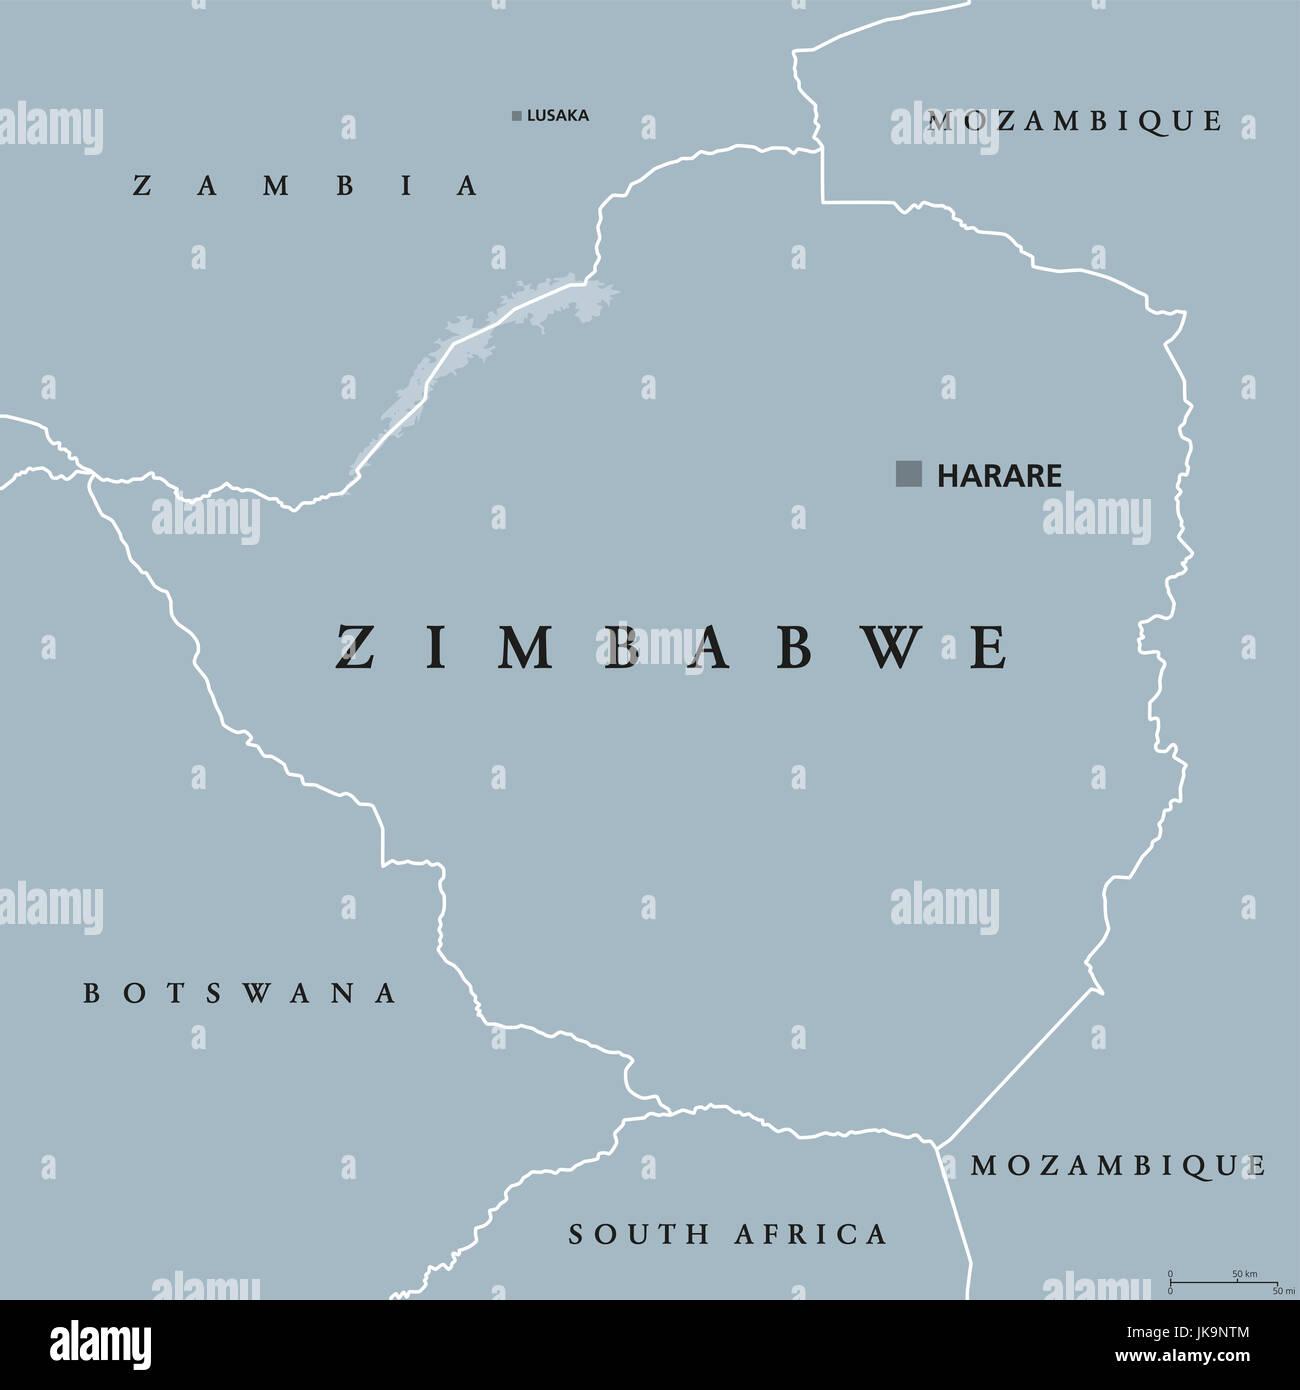 Zimbabwe Political Map With Capital Harare International Borders - Republic of zimbabwe map